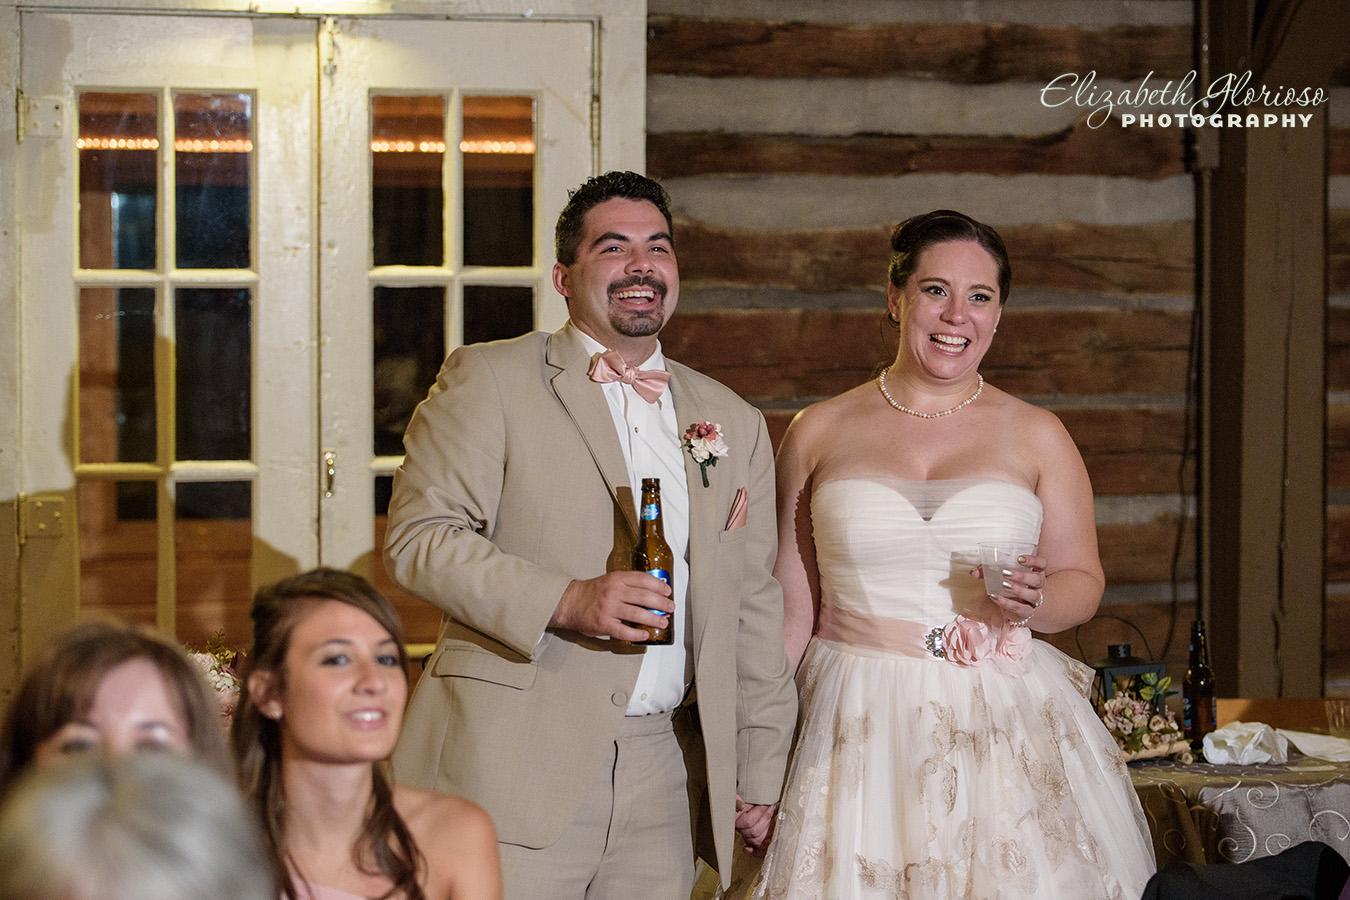 Vermilion_wedding_Glorioso Photography_1043